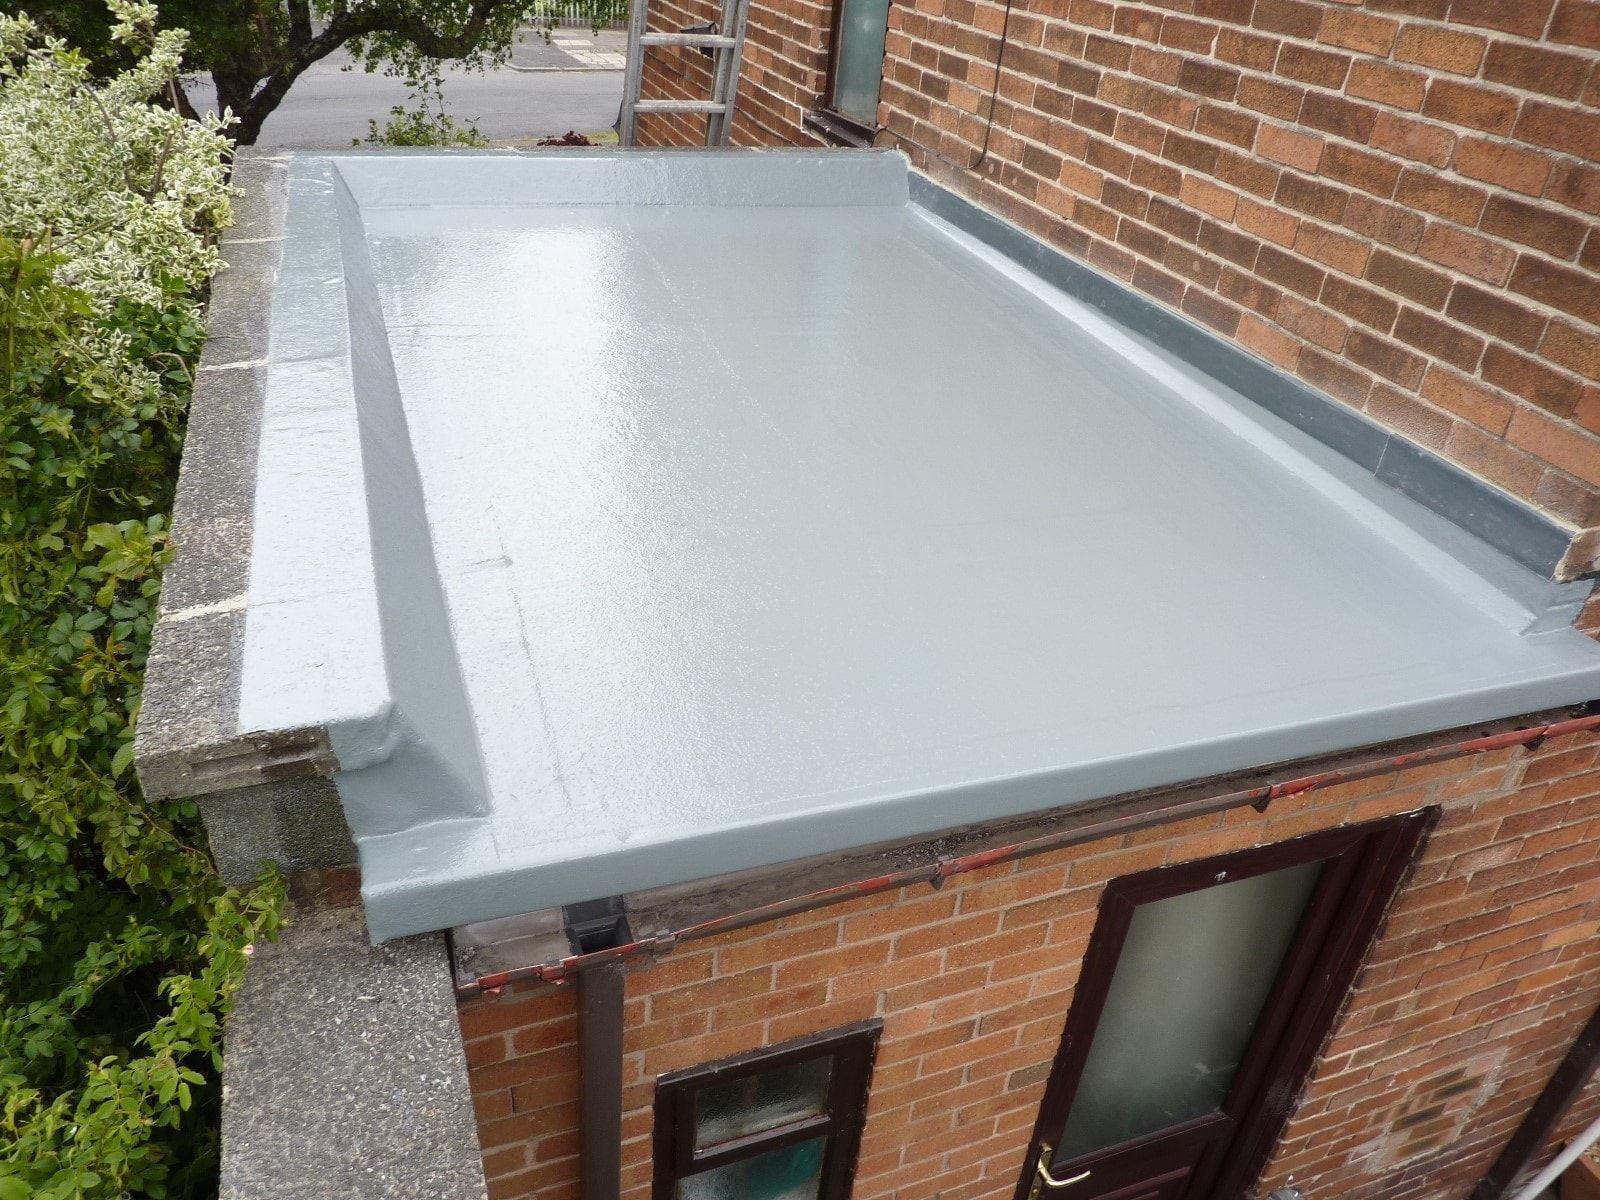 Fiberglass Flat Roofing Systems In 2020 Fibreglass Flat Roof Roof Cost Roofing Systems